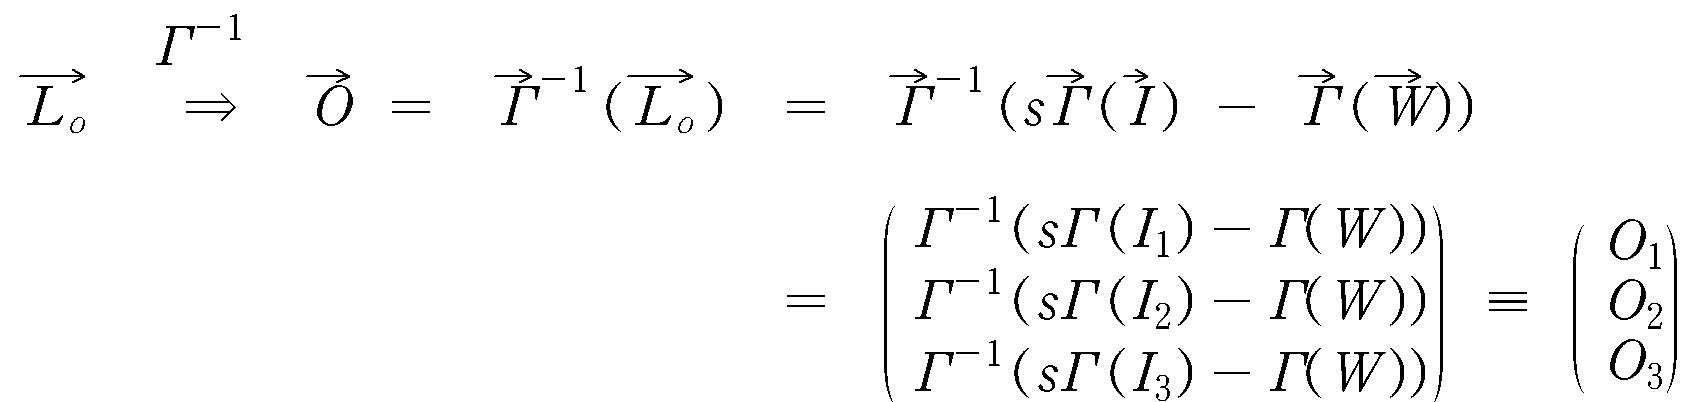 Figure 112004015960672-pat00027